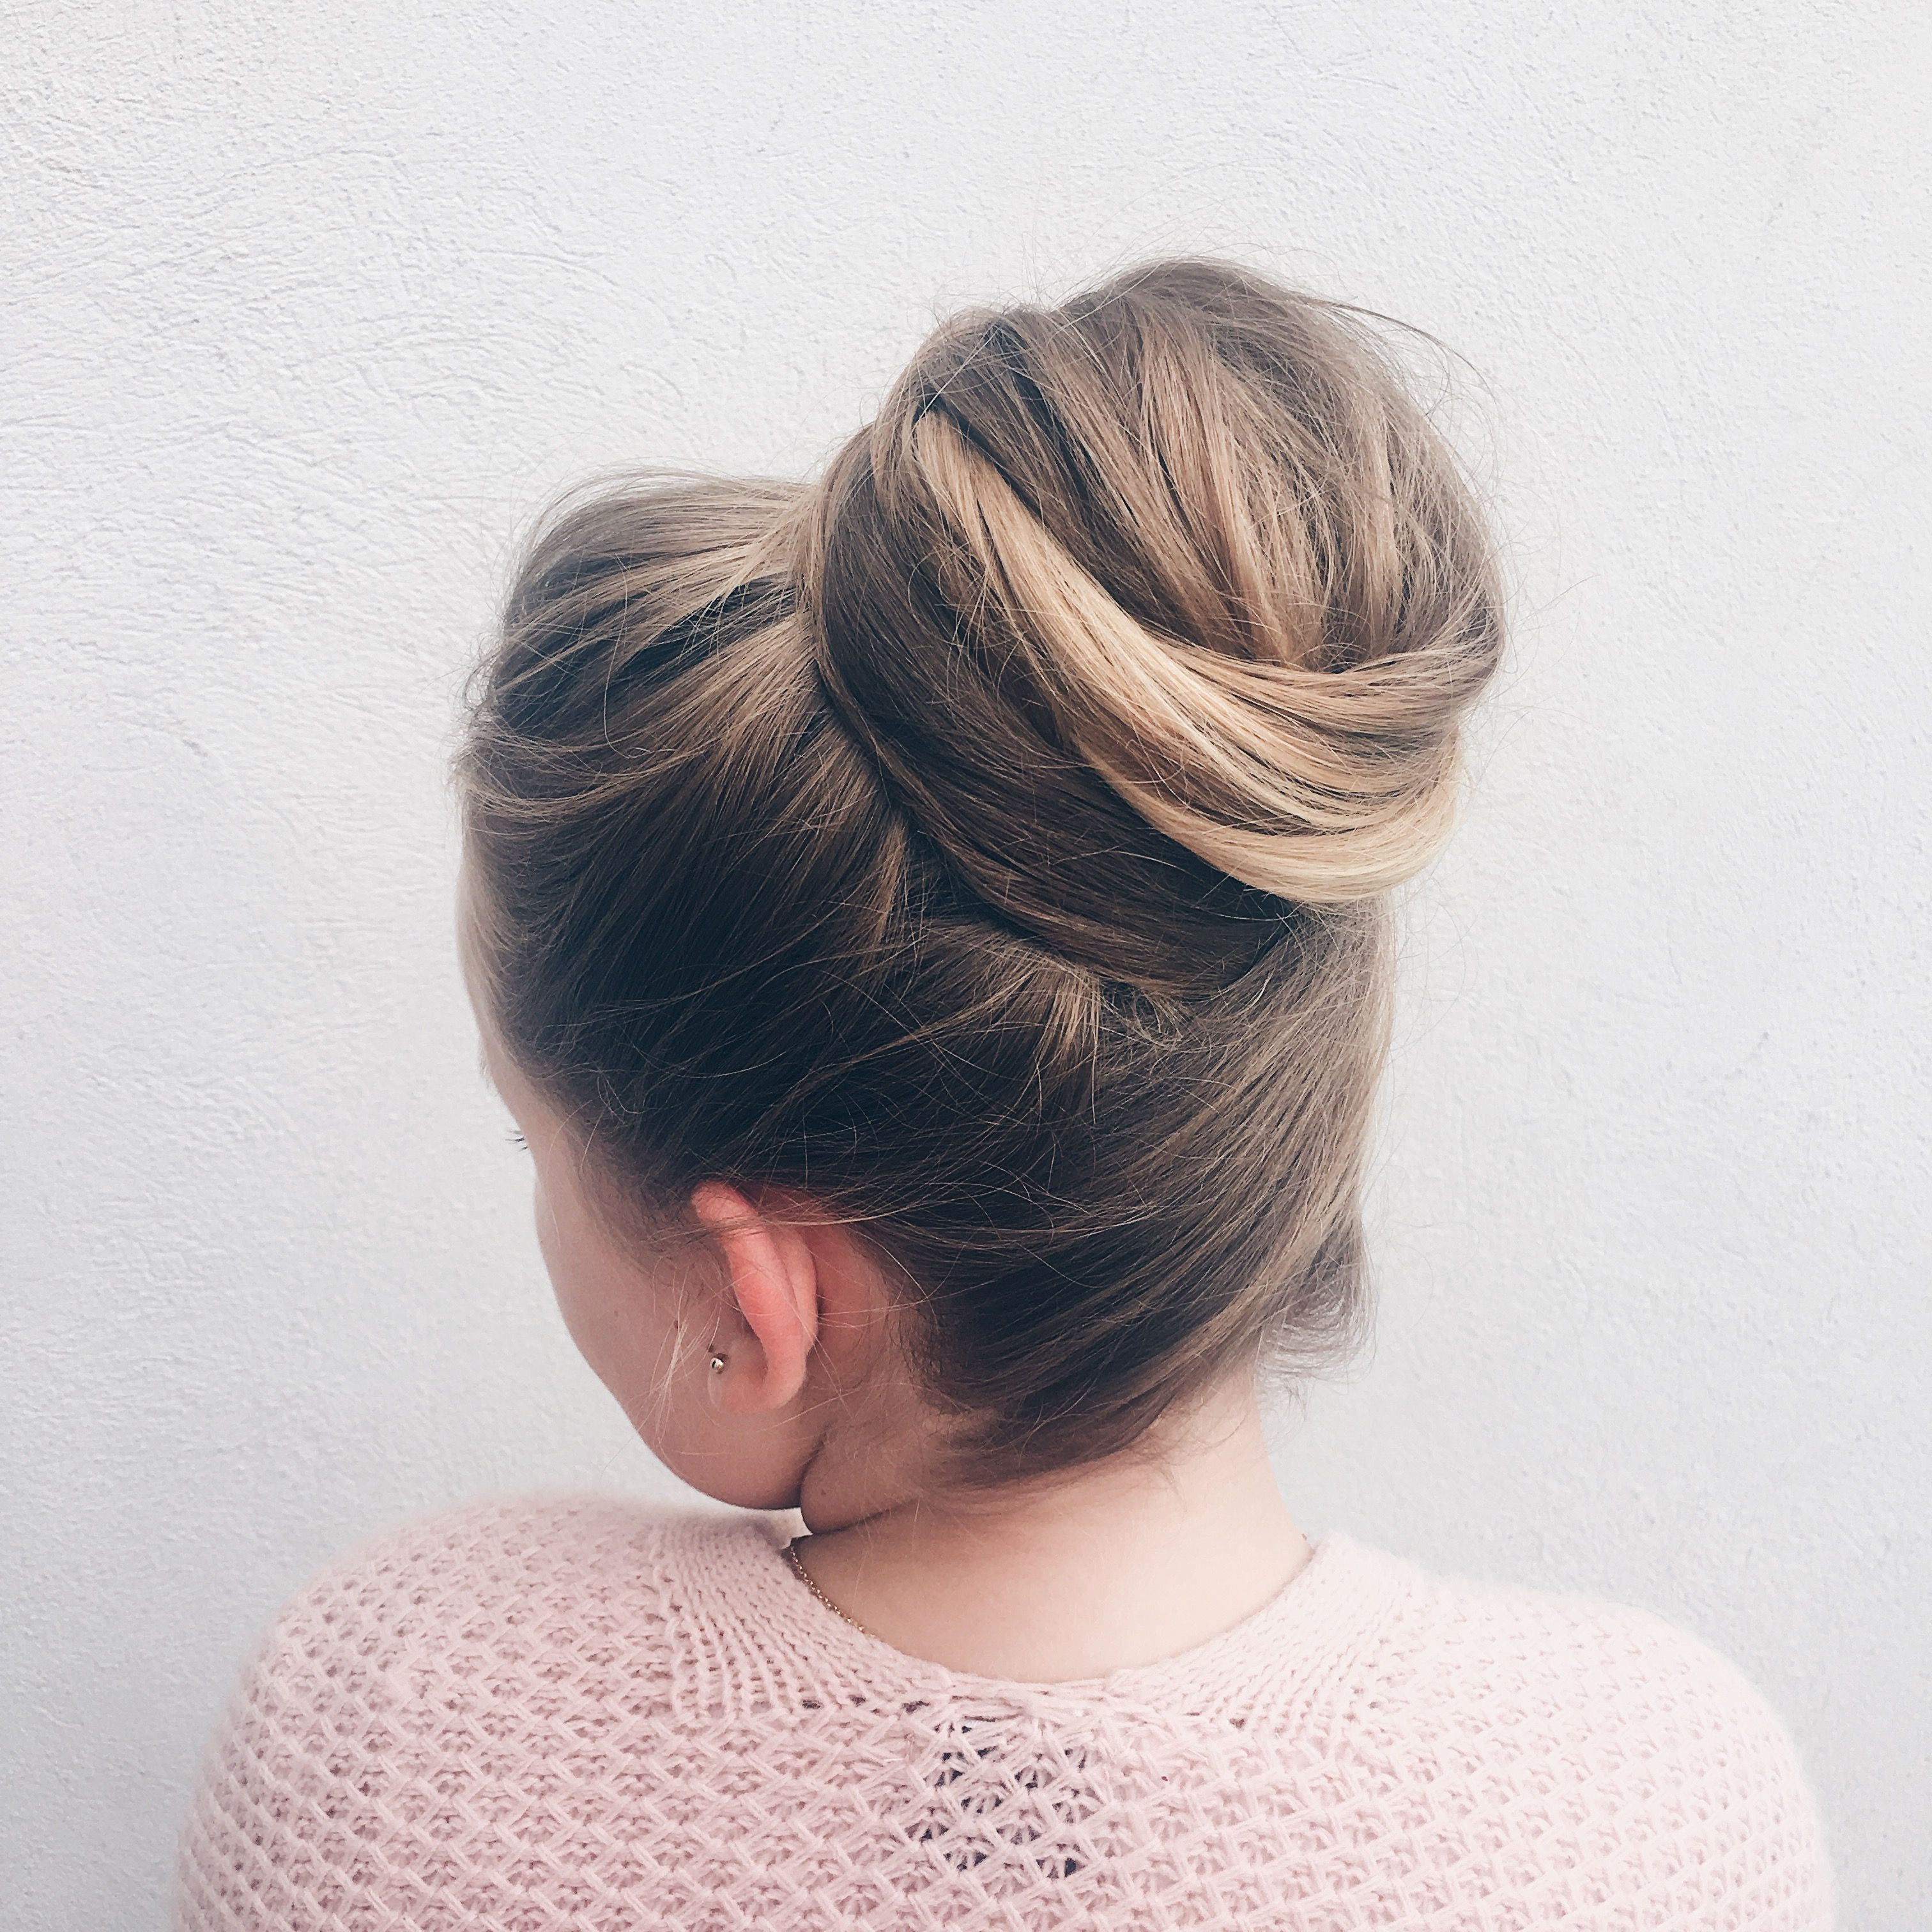 Chignon haut Half bun Wedding hair | Coiffure mariage, Chignon haut, Chignon